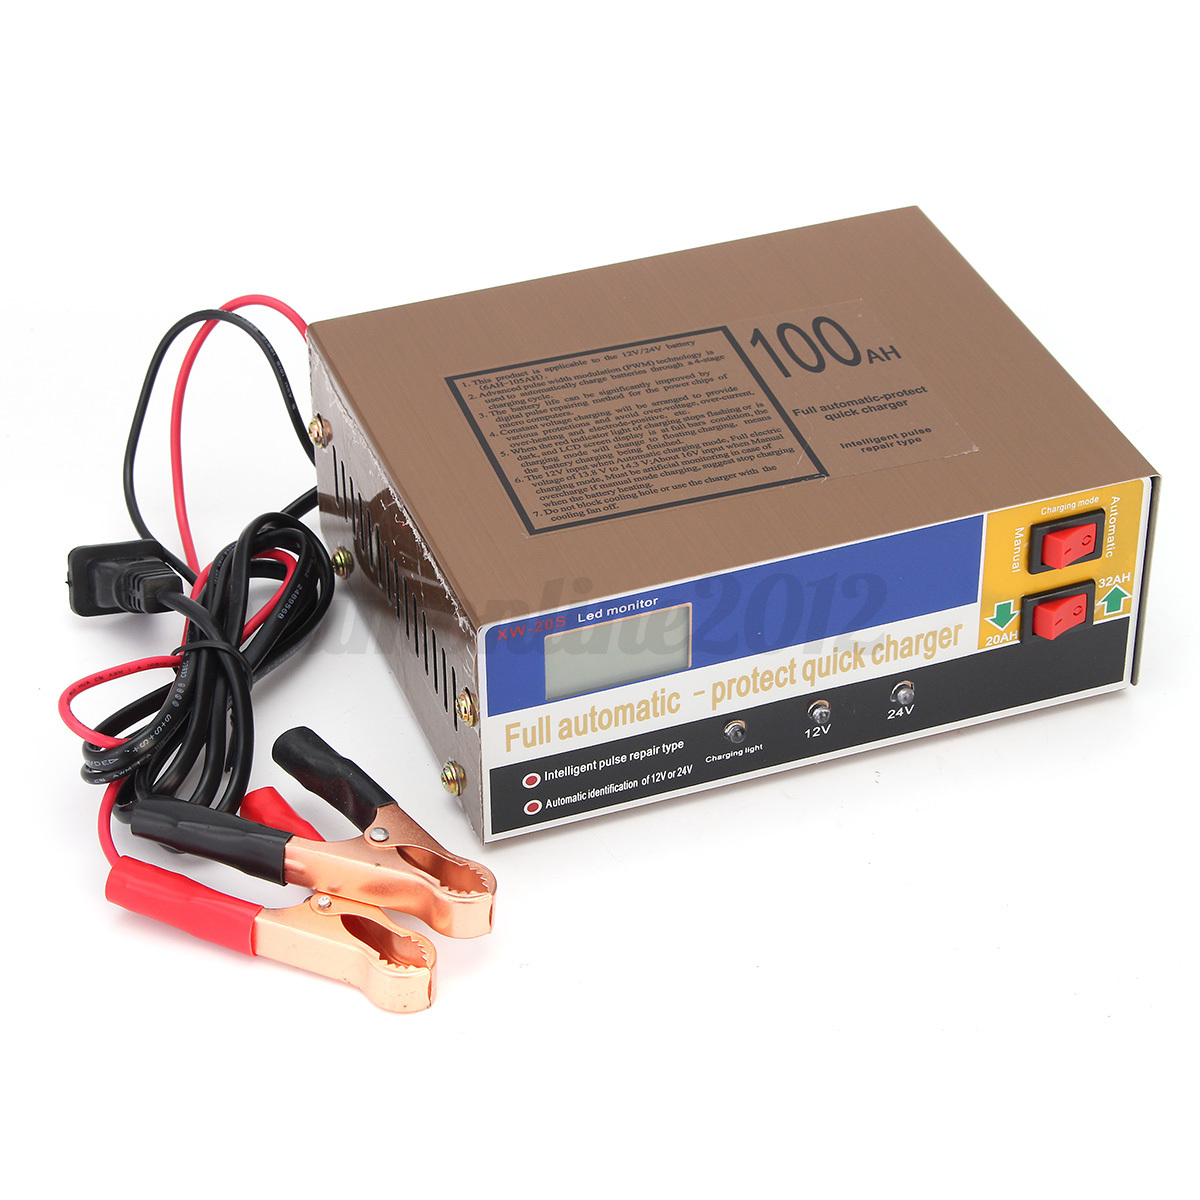 12 24v 100ah auto batterie ladeger t autoladeger t batterielader autobatterie ebay. Black Bedroom Furniture Sets. Home Design Ideas